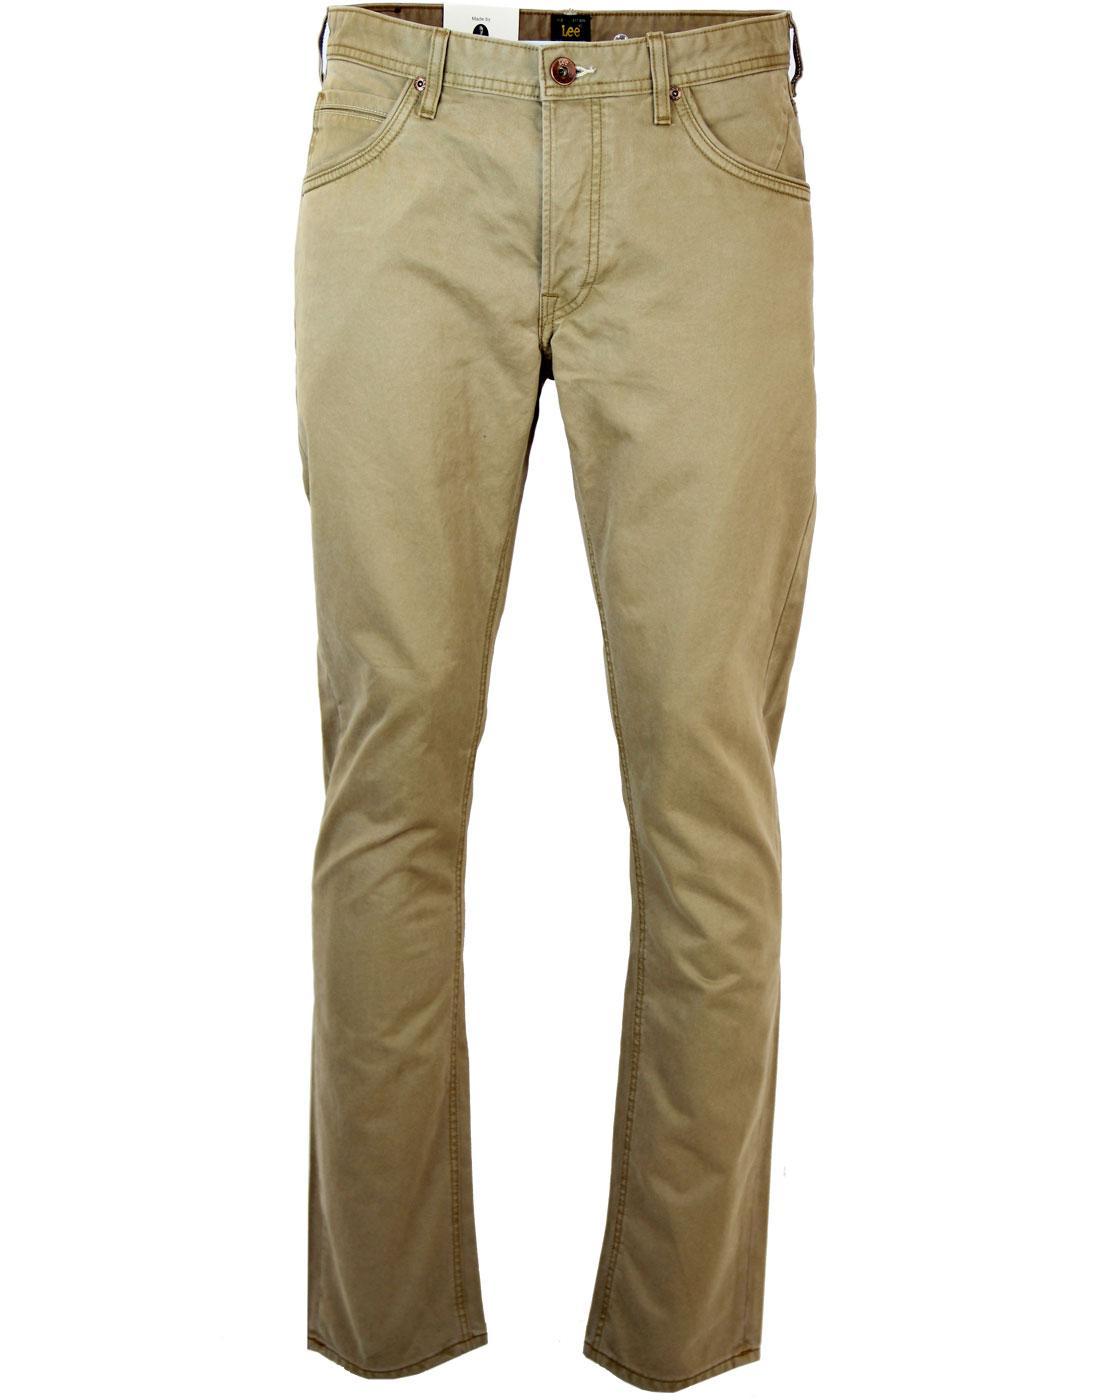 Daren LEE JEANS Retro Regular Slim Cotton Jeans